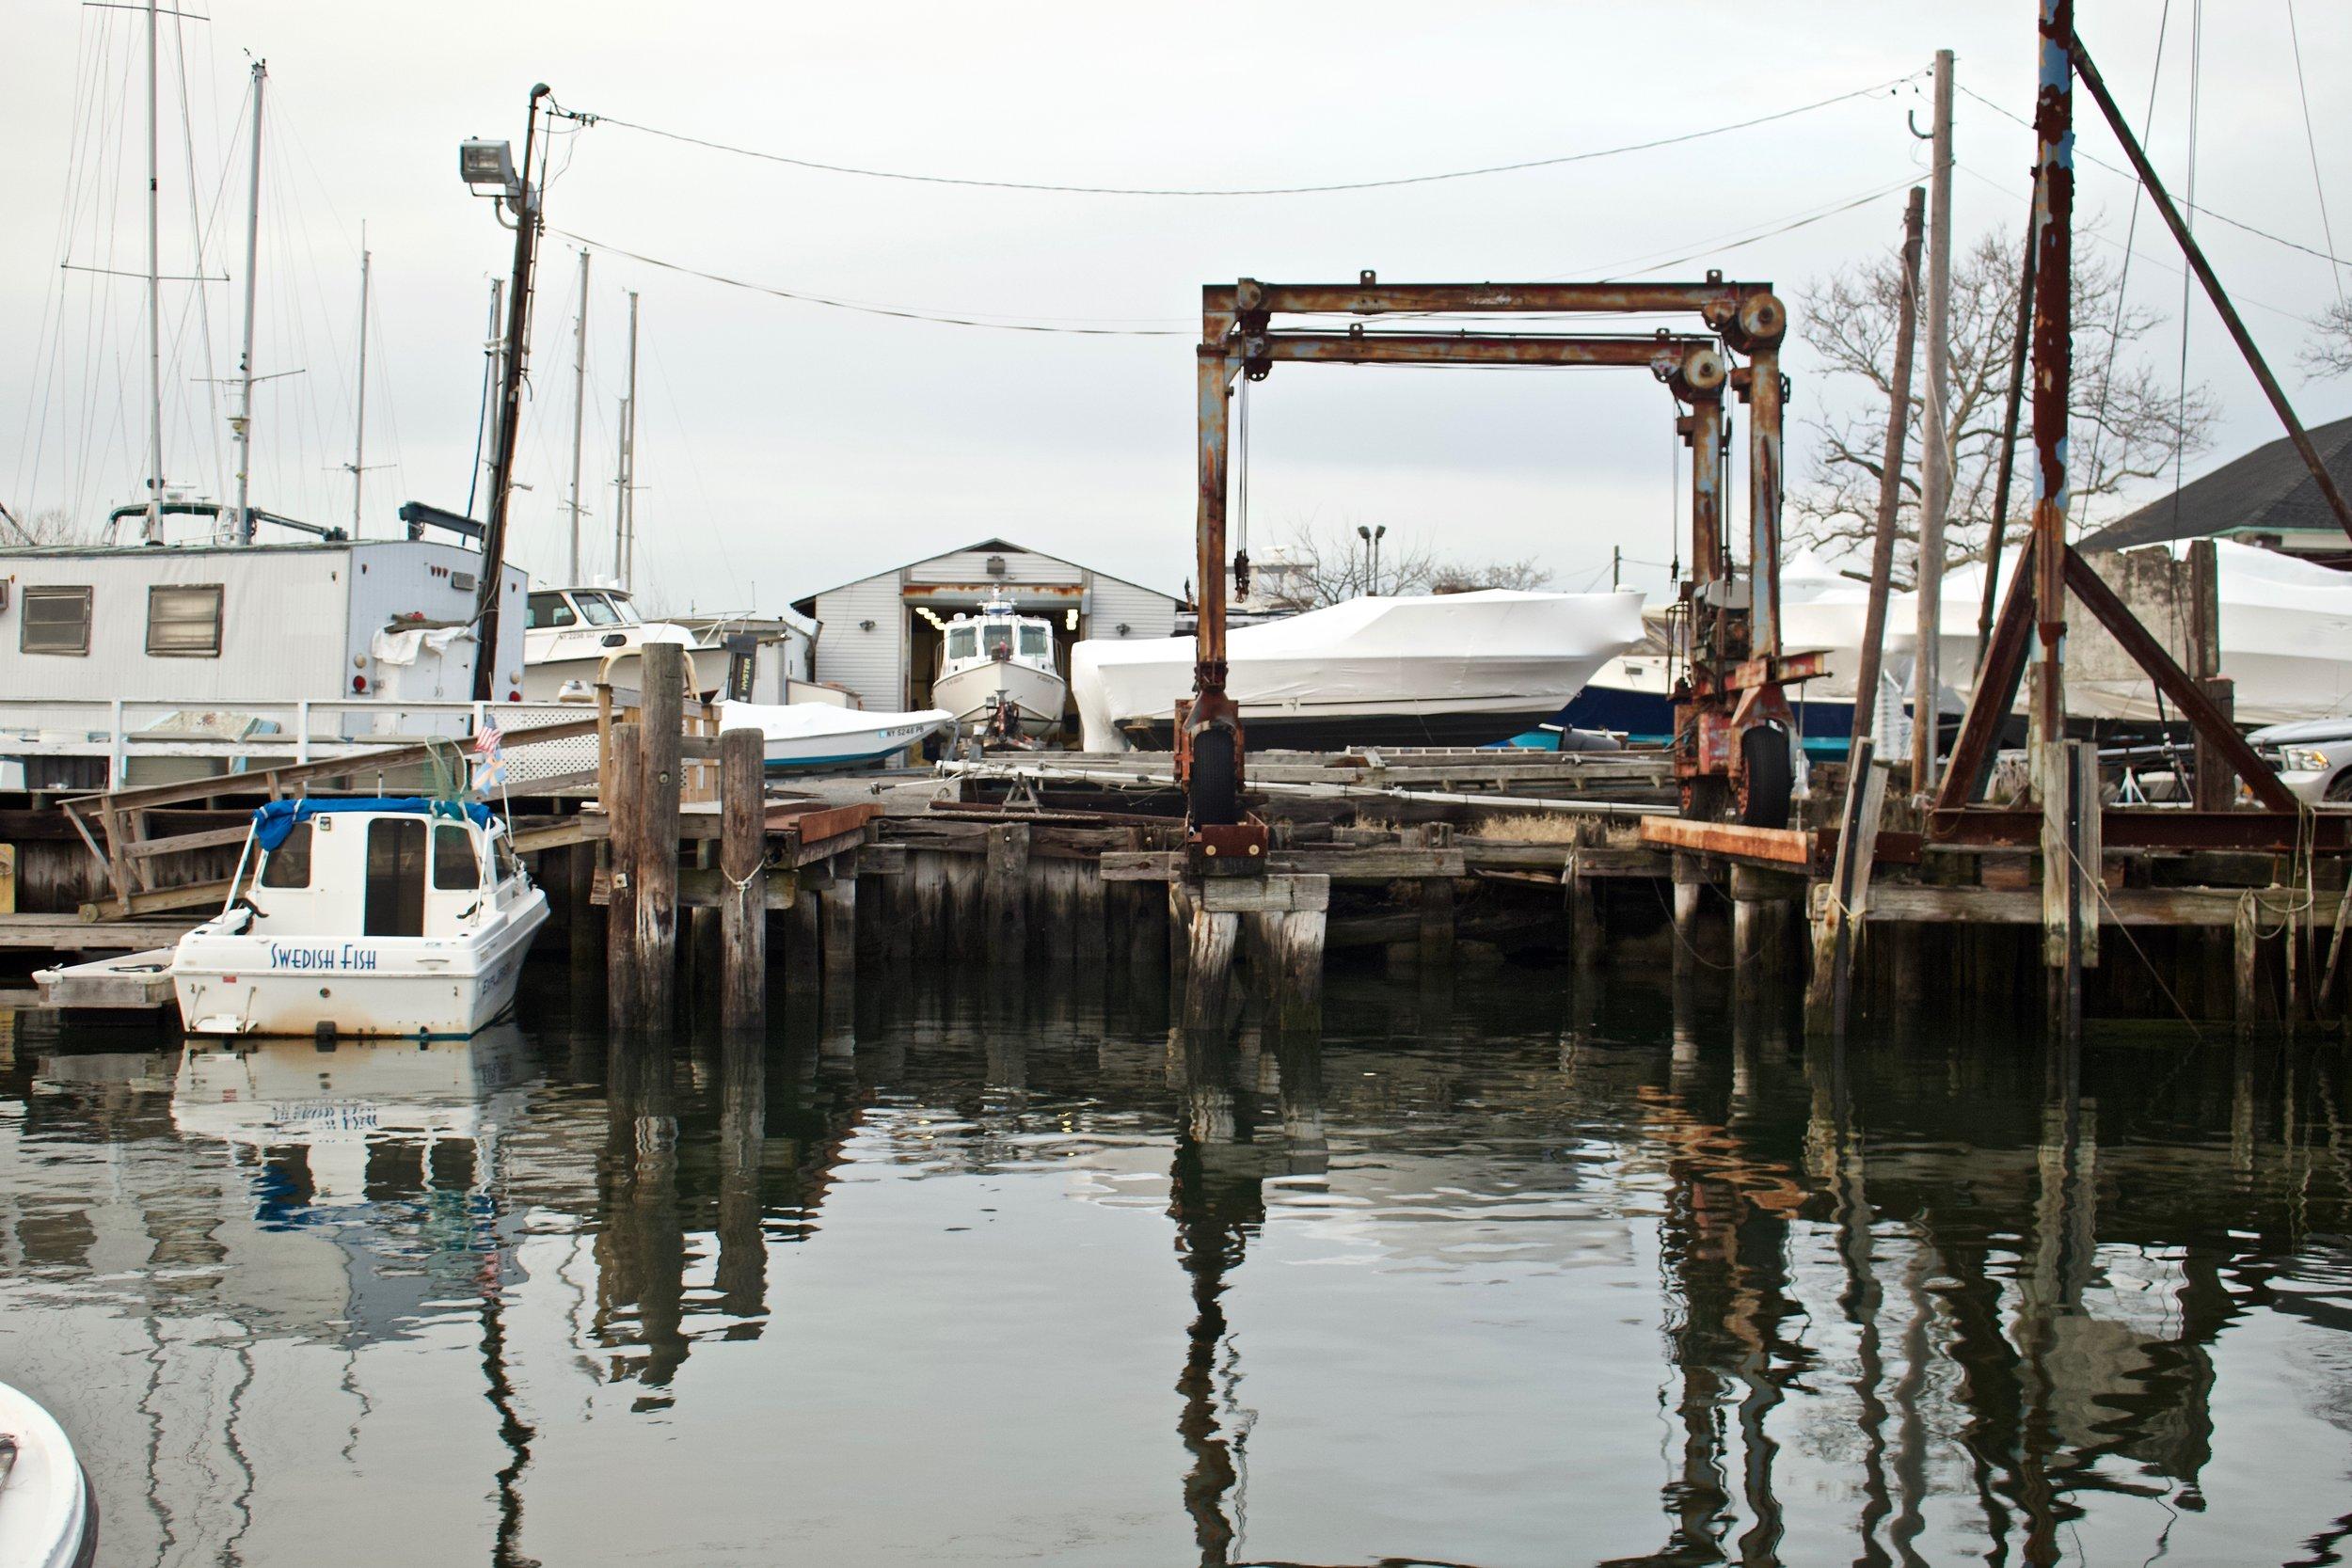 Marina 59 (Rockaway Beach) Reflection